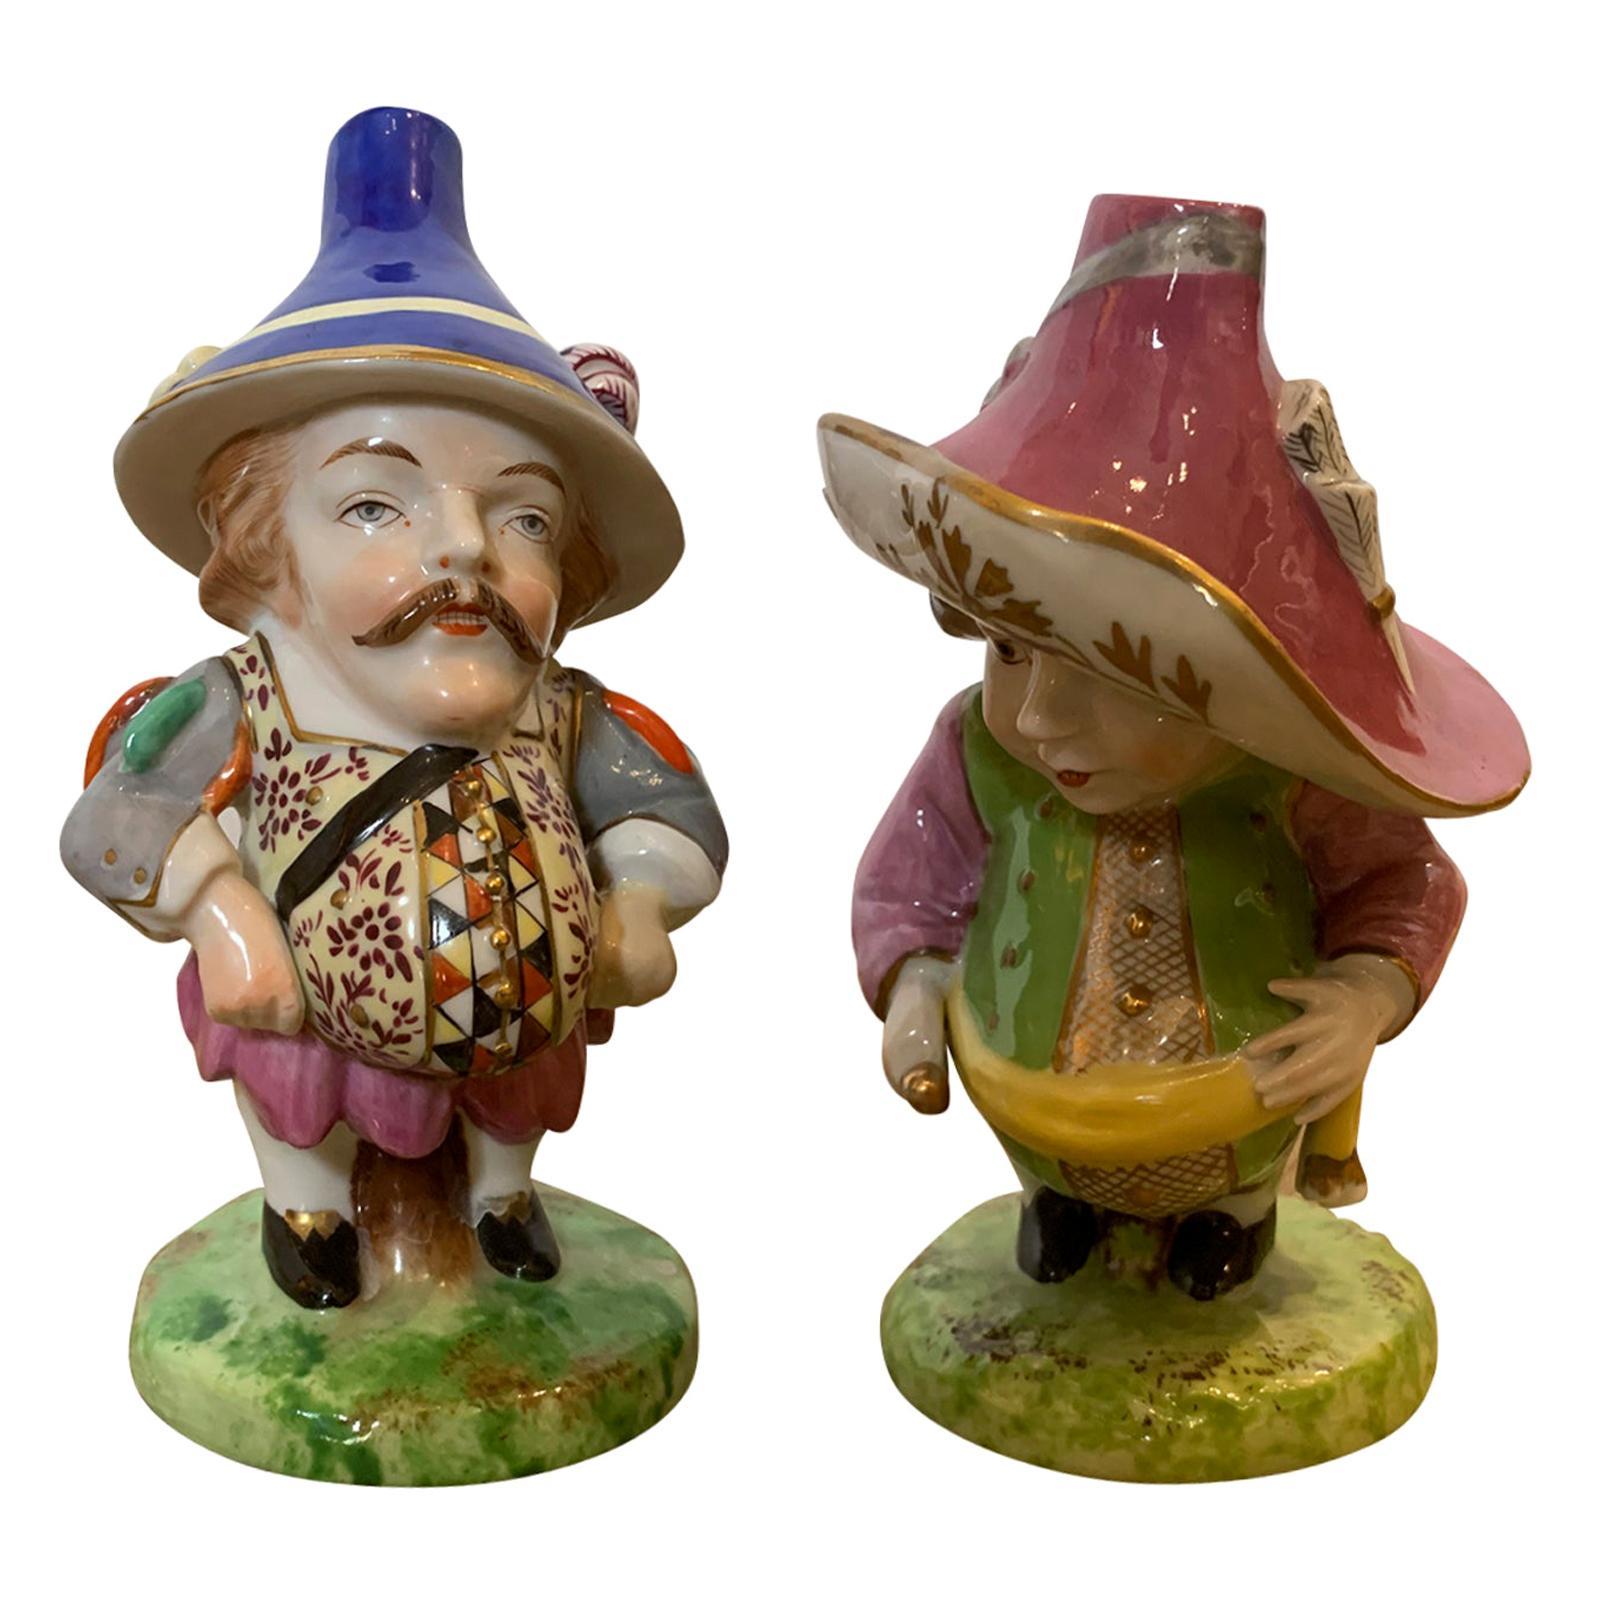 Pair of English Derby Style Porcelain Mansion House Dwarfs, Probably Edme Samson